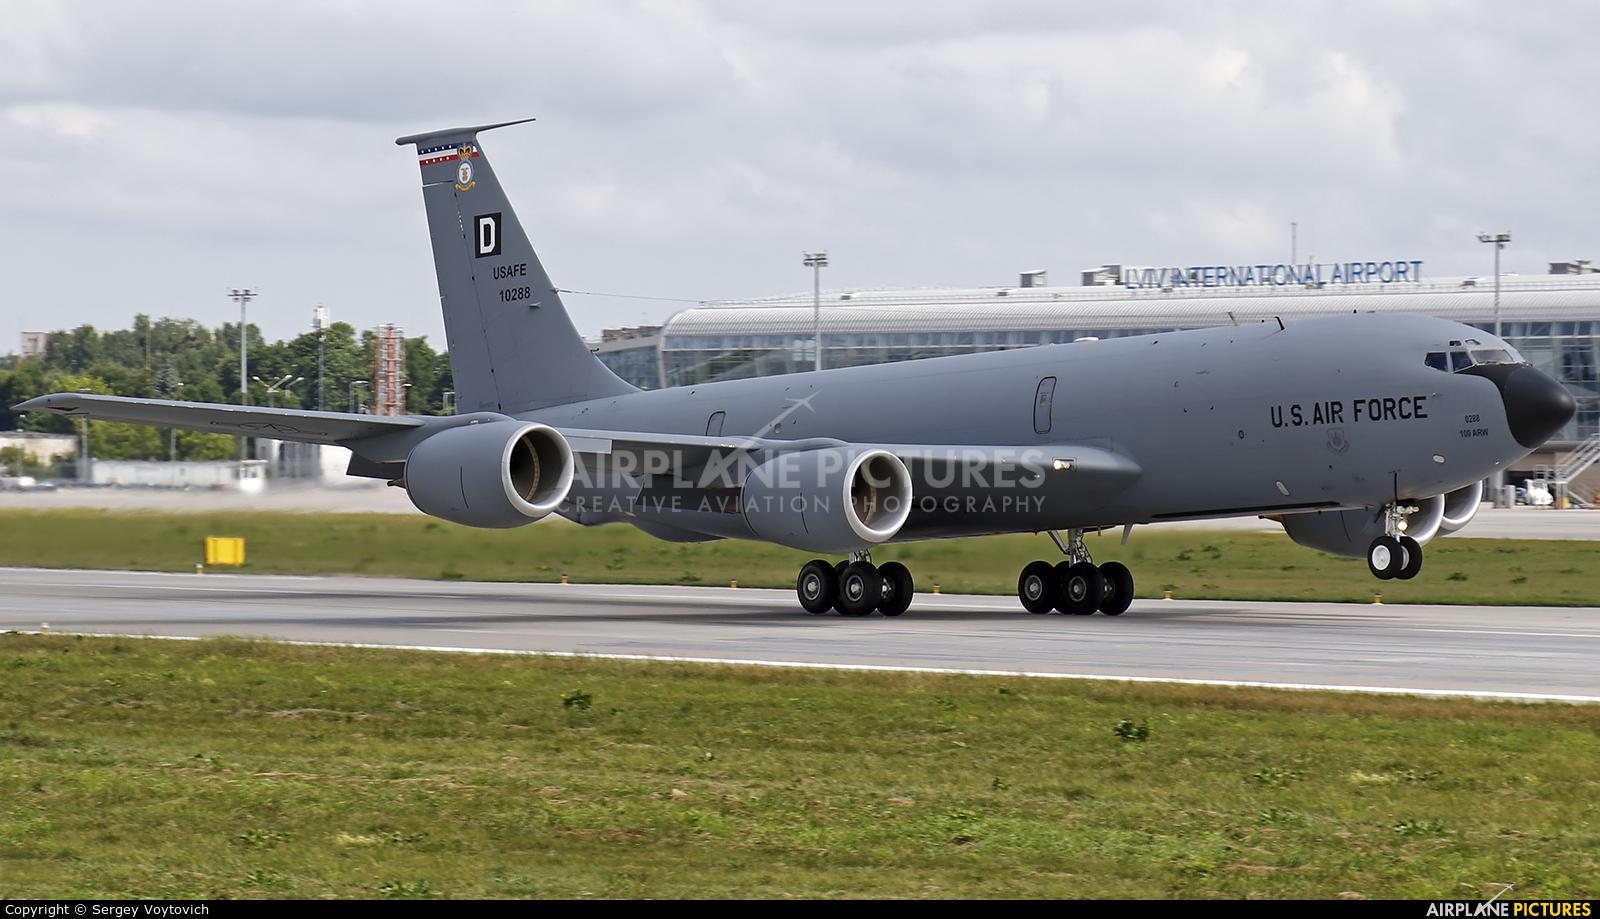 USA - Air Force 61-0288 aircraft at Lviv Danylo Halytskyi International Airport (Lwów Skniłów)